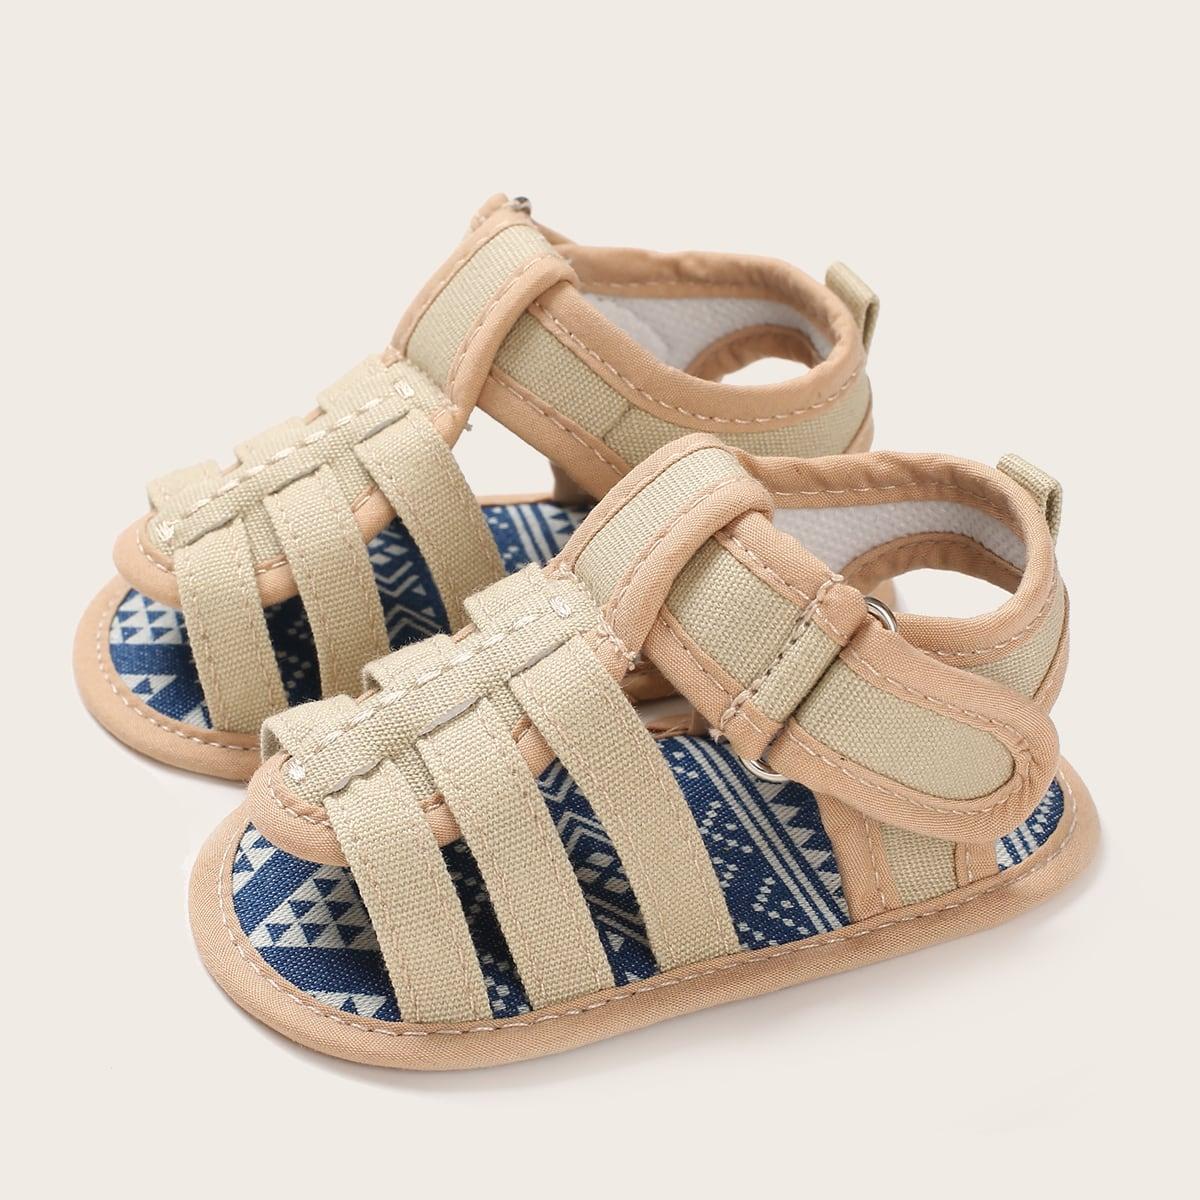 Baby Open Toe Strap Flat Sandals